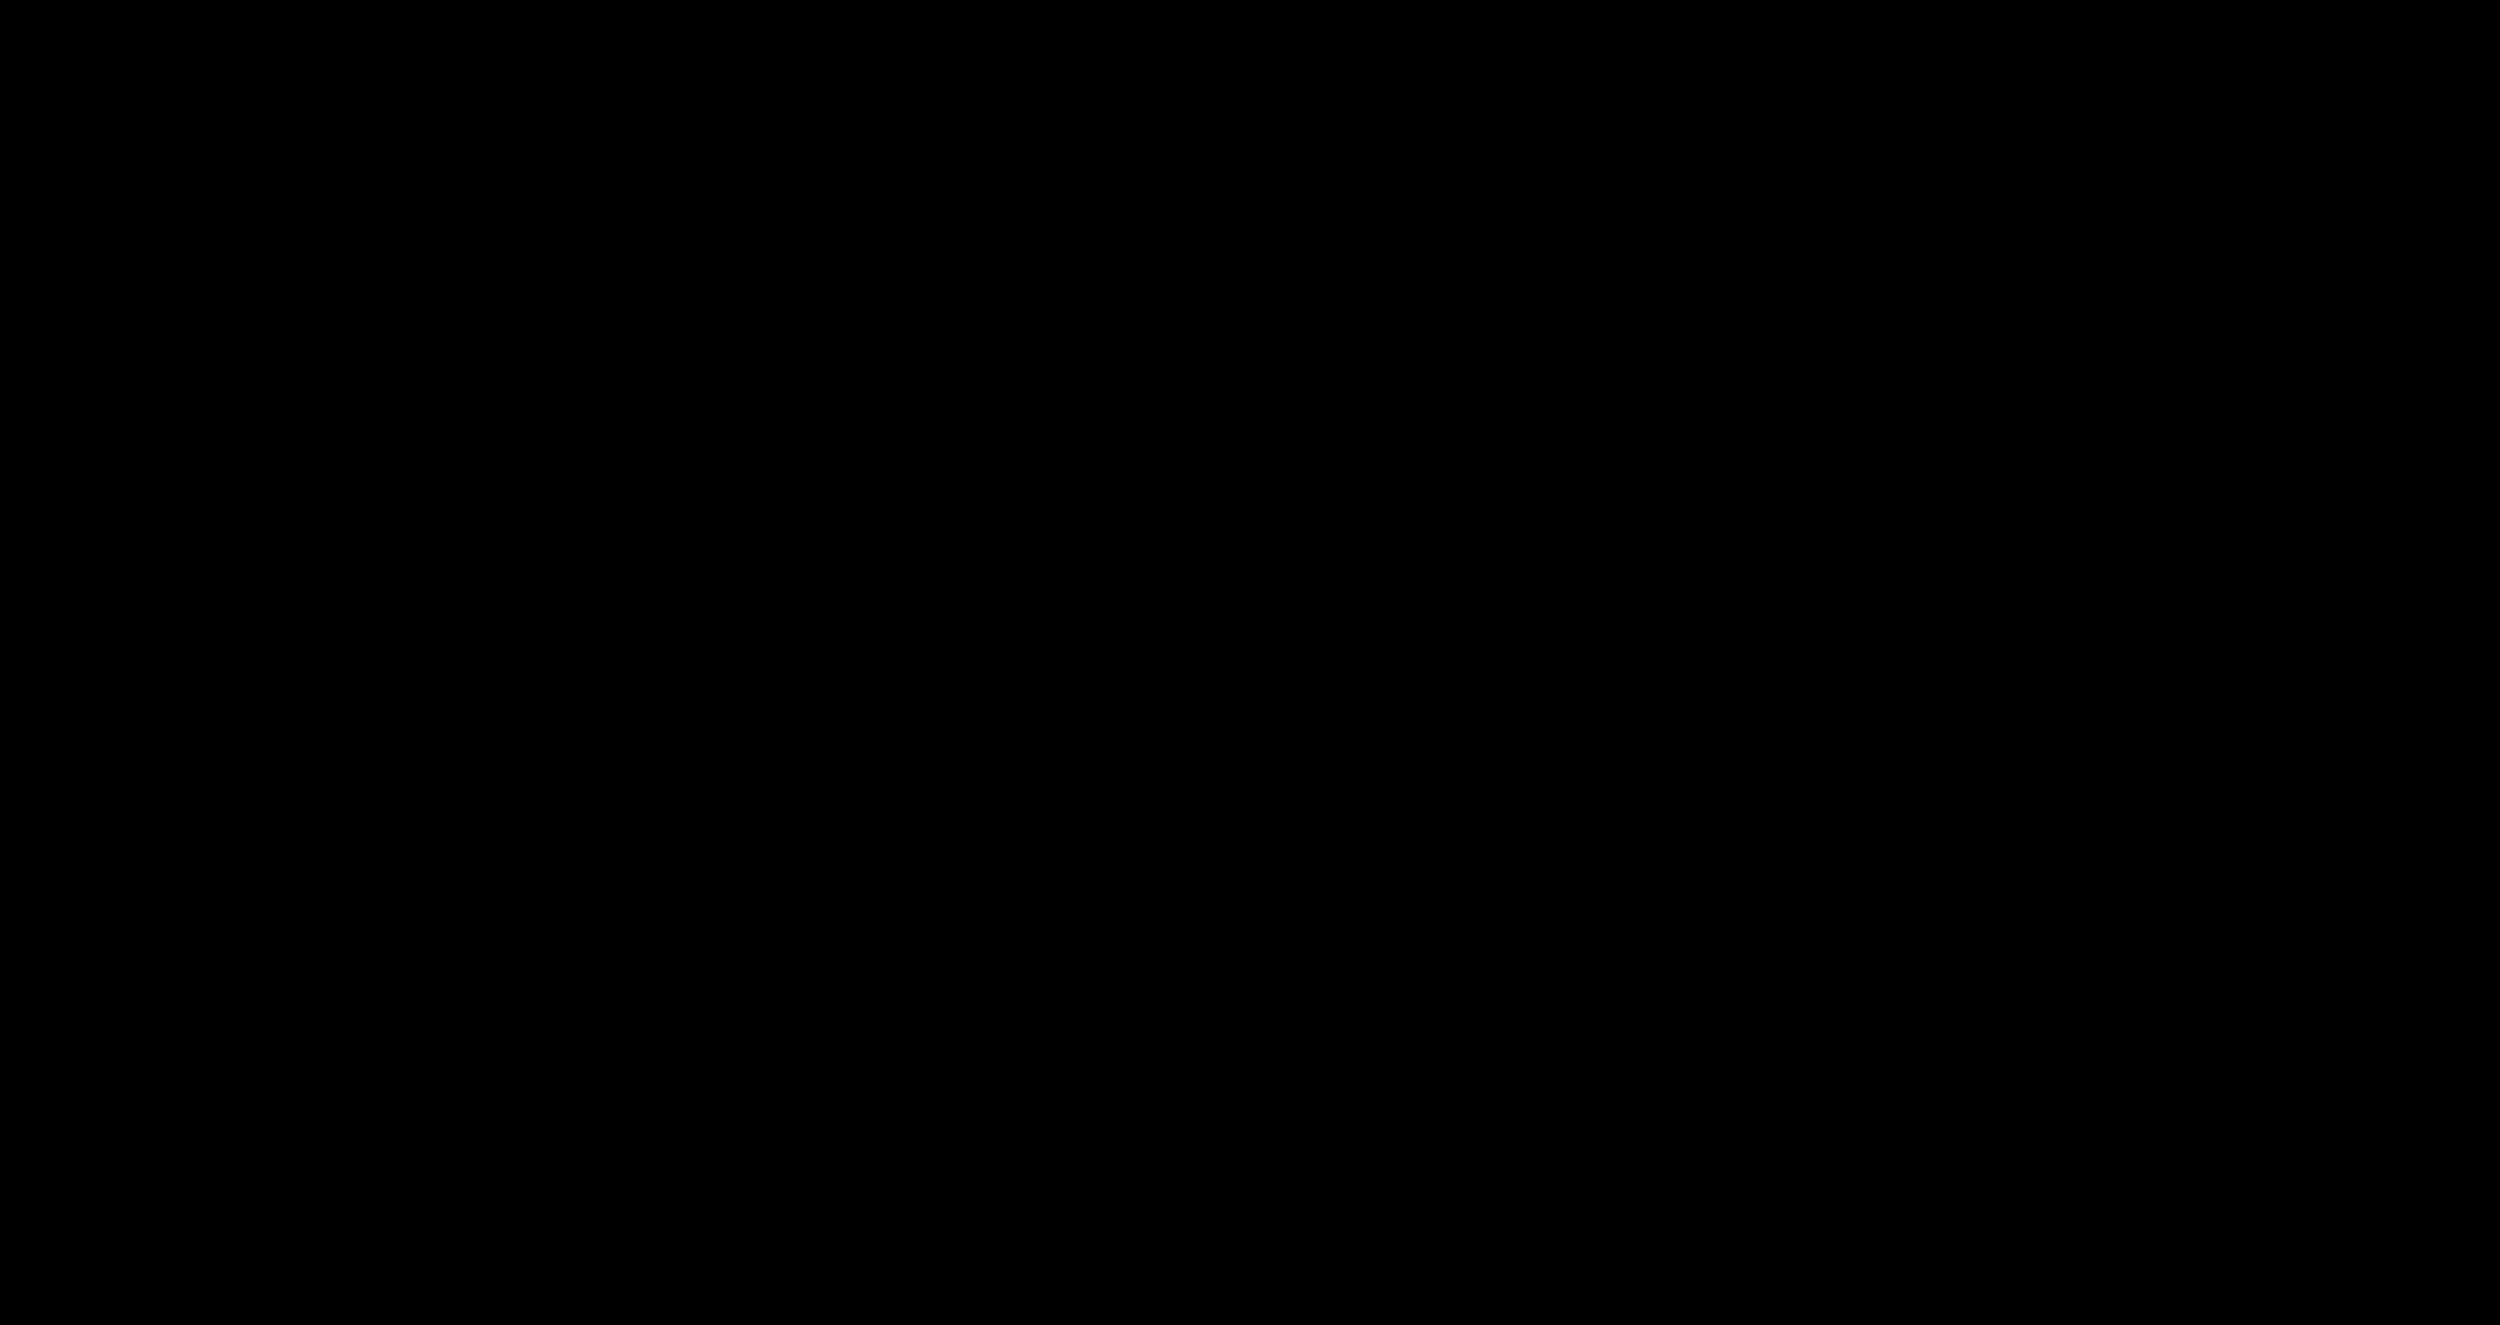 INTERIOR DESIGN-logo-black.png